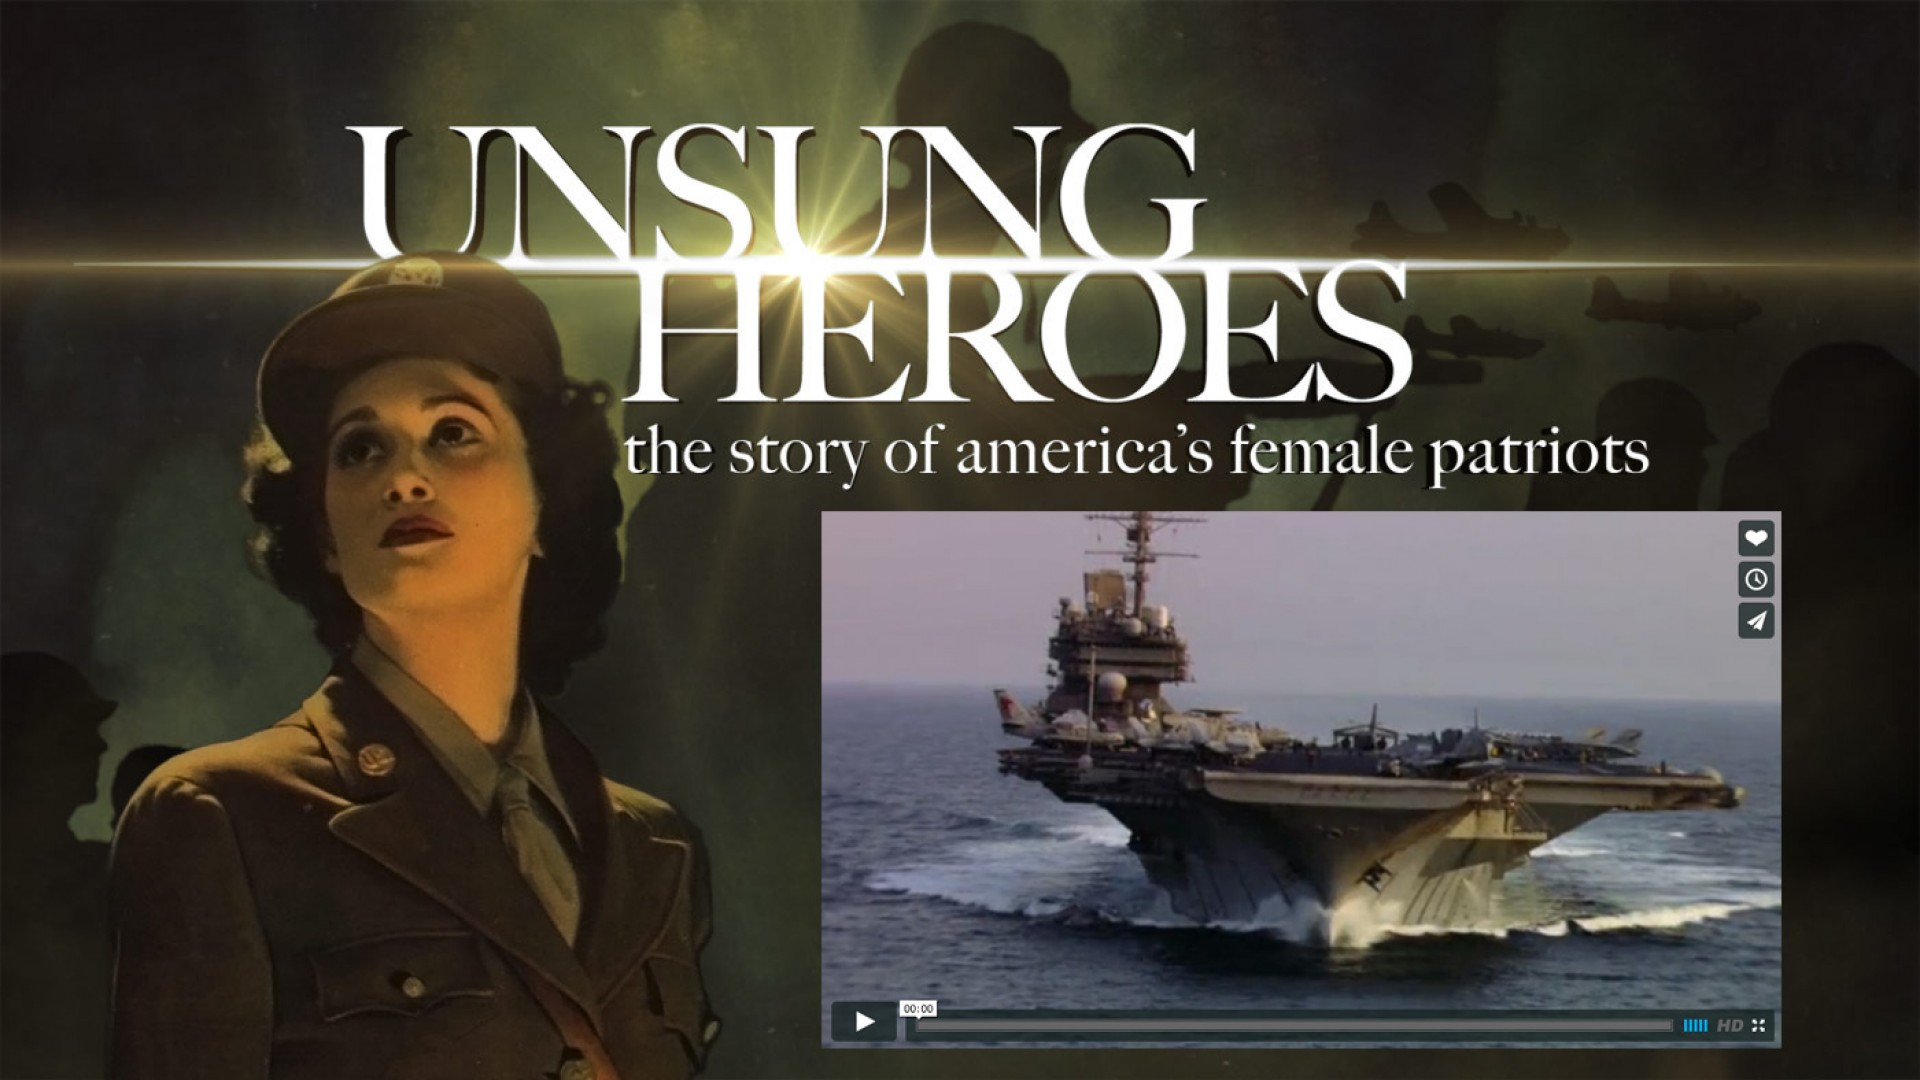 010 Unsung Heroes Essay Example Fantastic Of India Hero Intro My Mom 1920